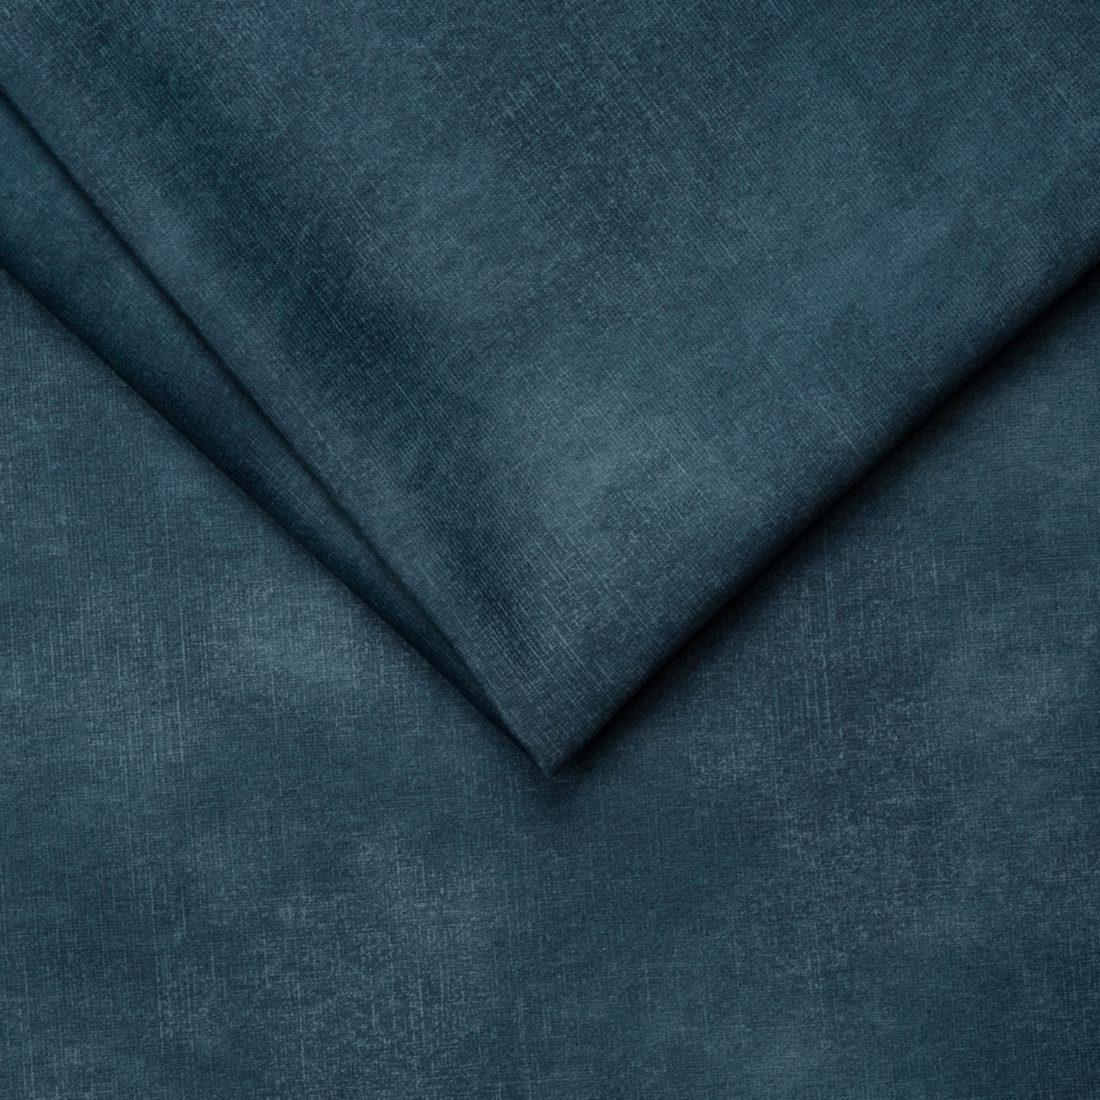 Меблева тканина Palladium 13 Azur, велюр